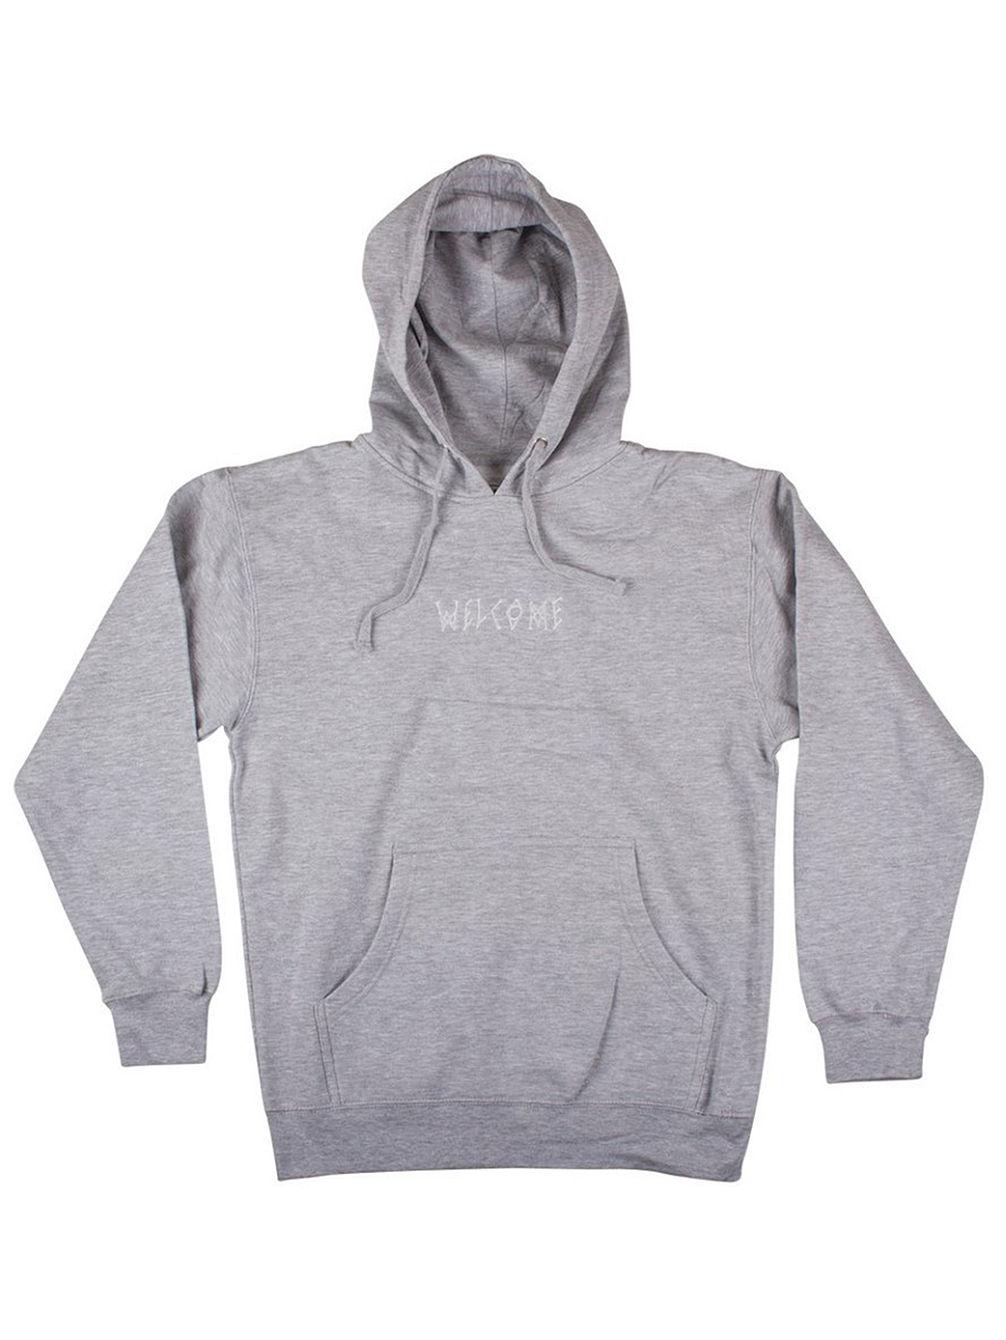 welcome-scrawl-hoodie